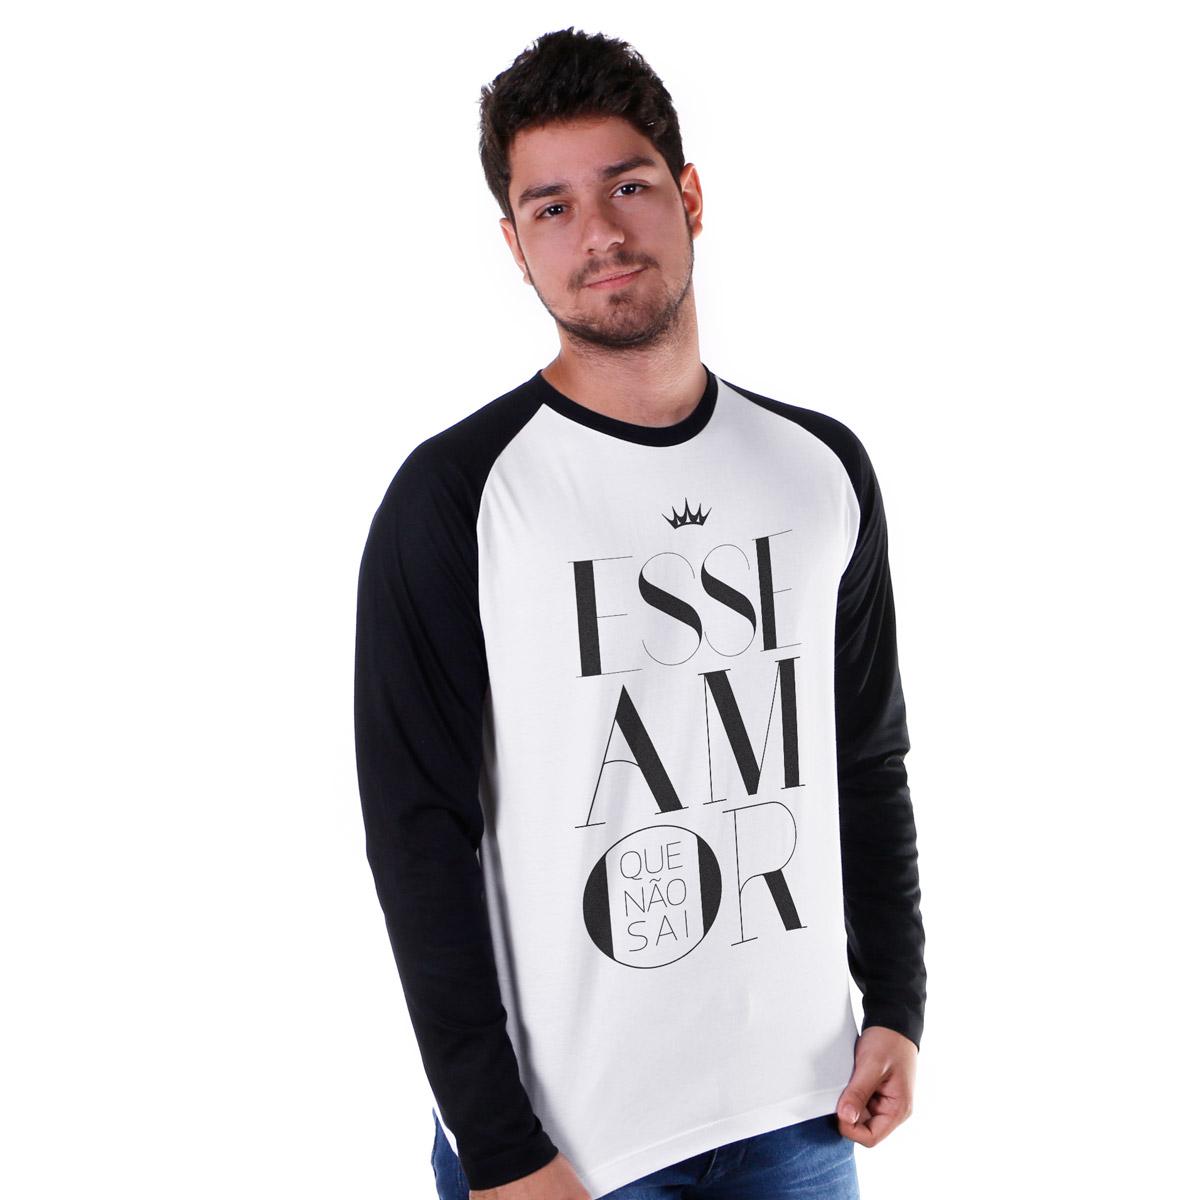 Camiseta Manga Longa Raglan Masculina Ivete Sangalo Esse Amor